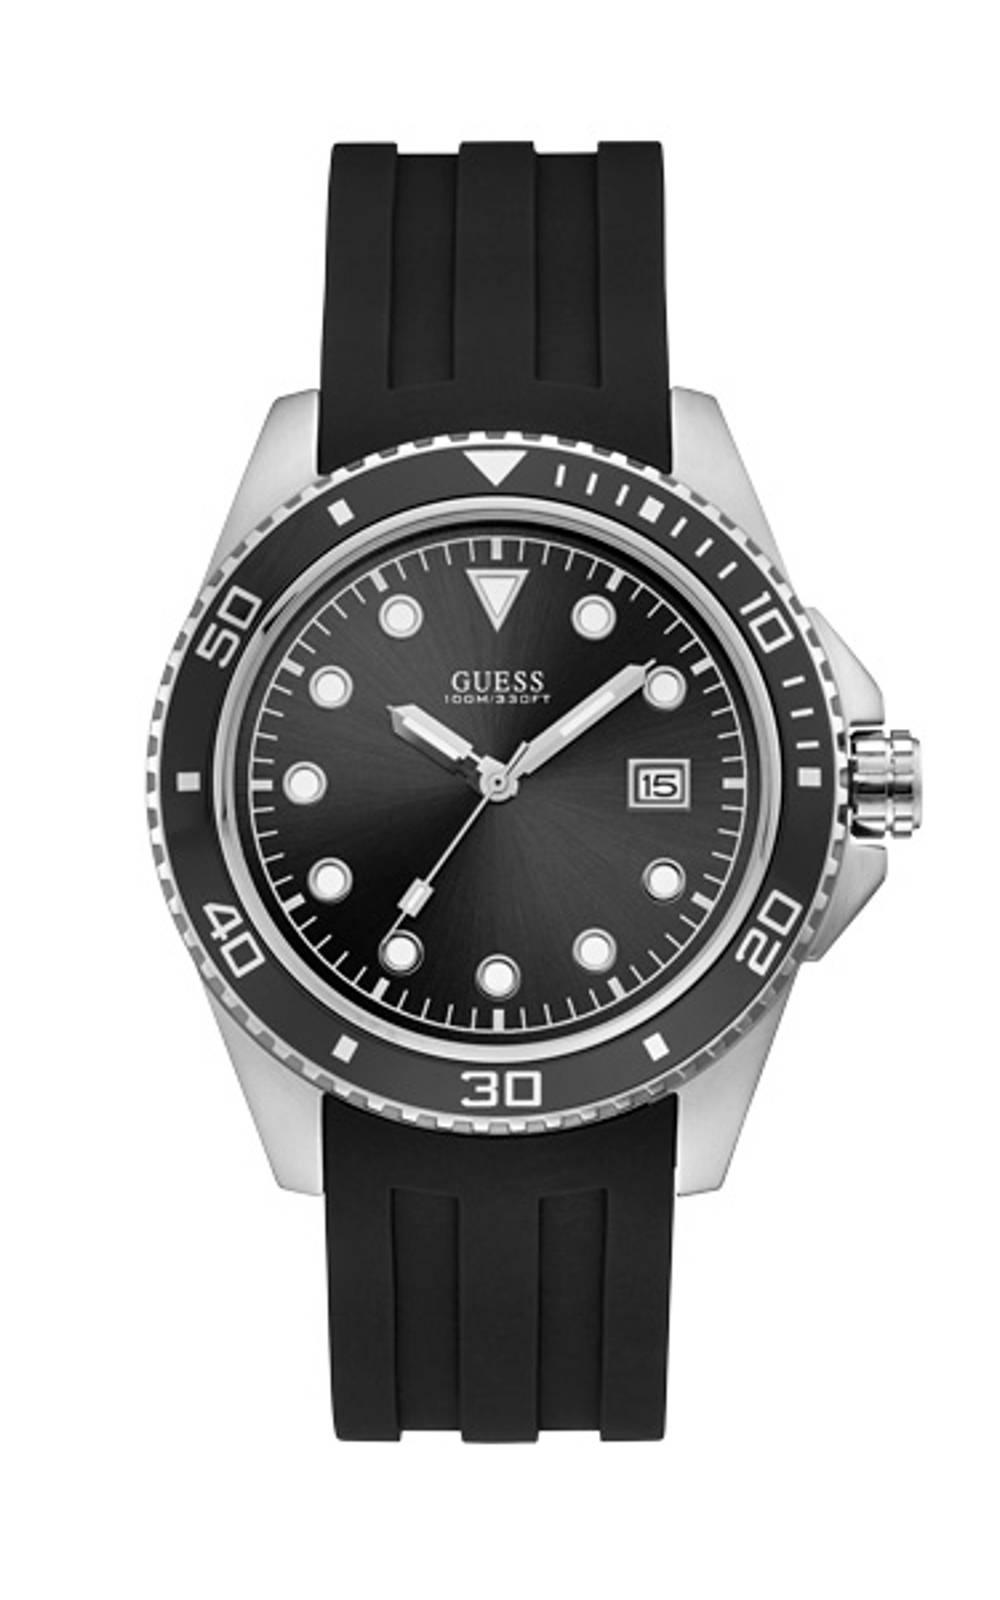 GUESS W1109G1 Ανδρικό Ρολόι Quartz Ακριβείας